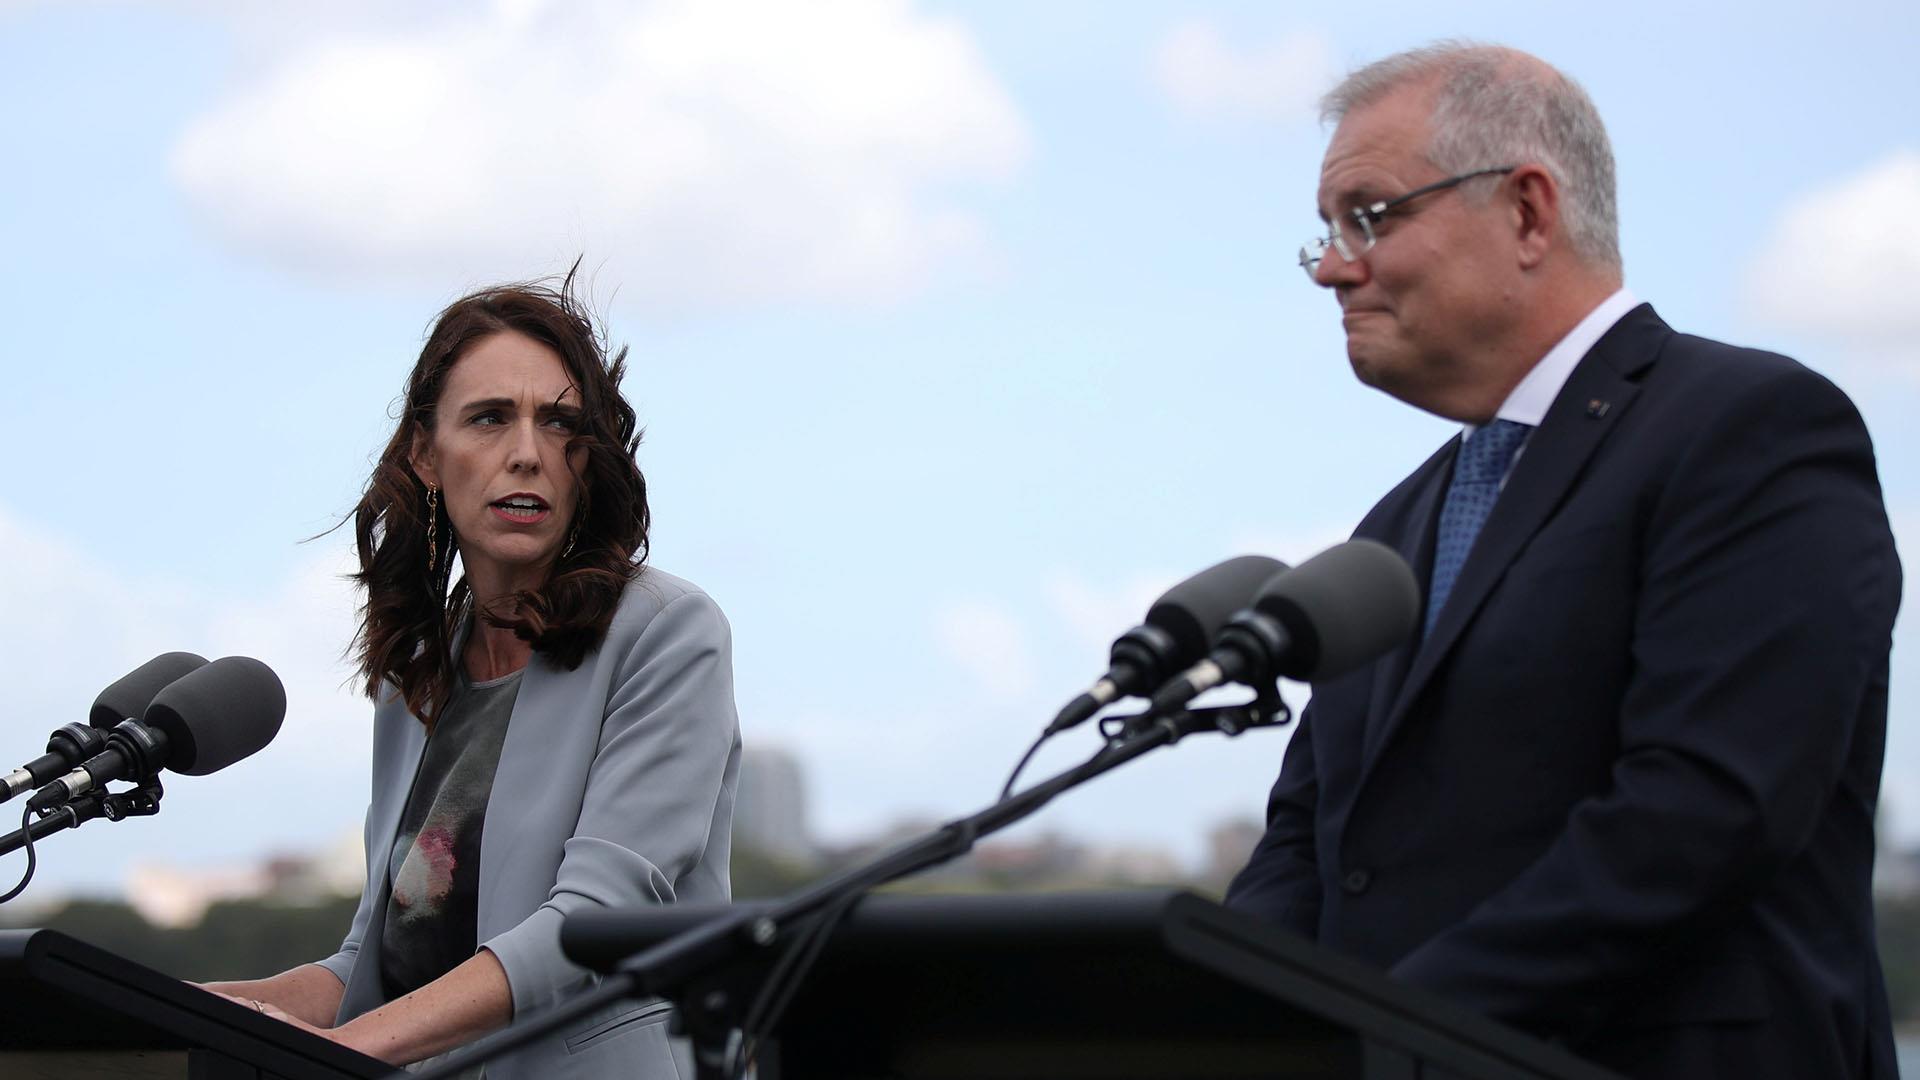 New Zealand PM Jacinda Ardern berates Australia's Scott Morrison about deportations